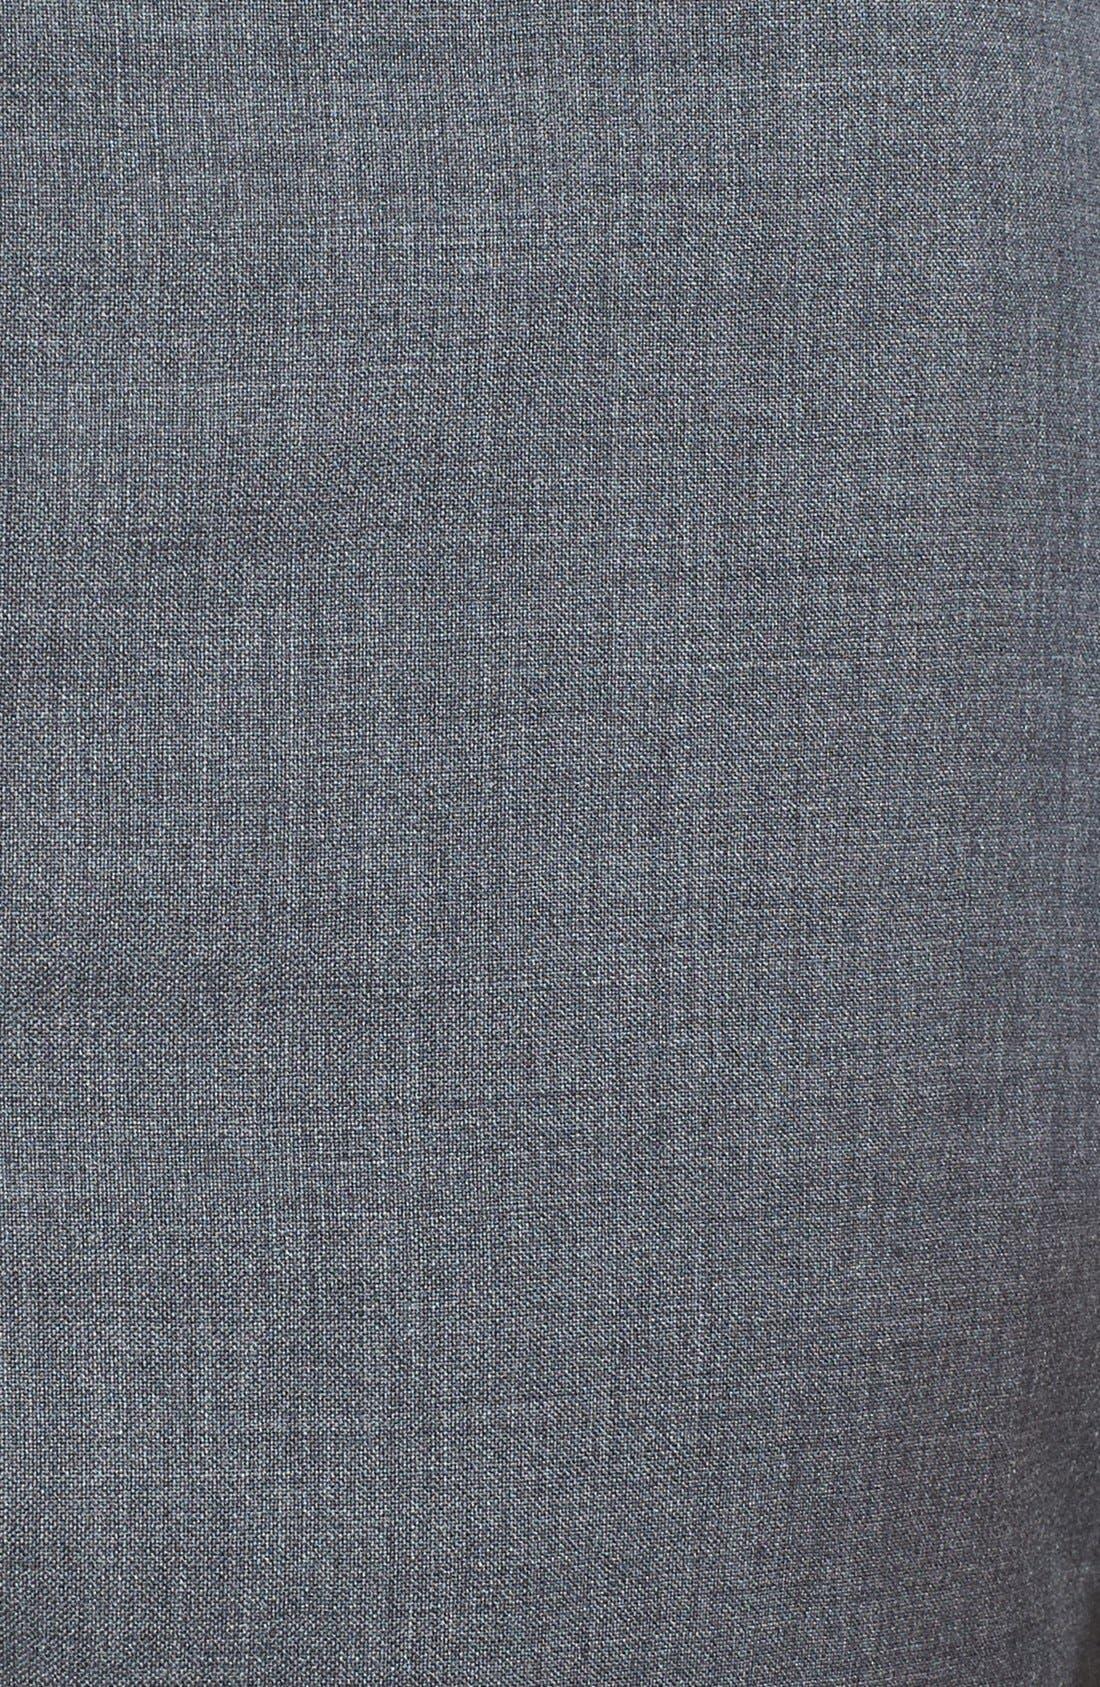 Alternate Image 2  - BOSS 'Sharp' Slim Fit Flat Front Wool Trousers